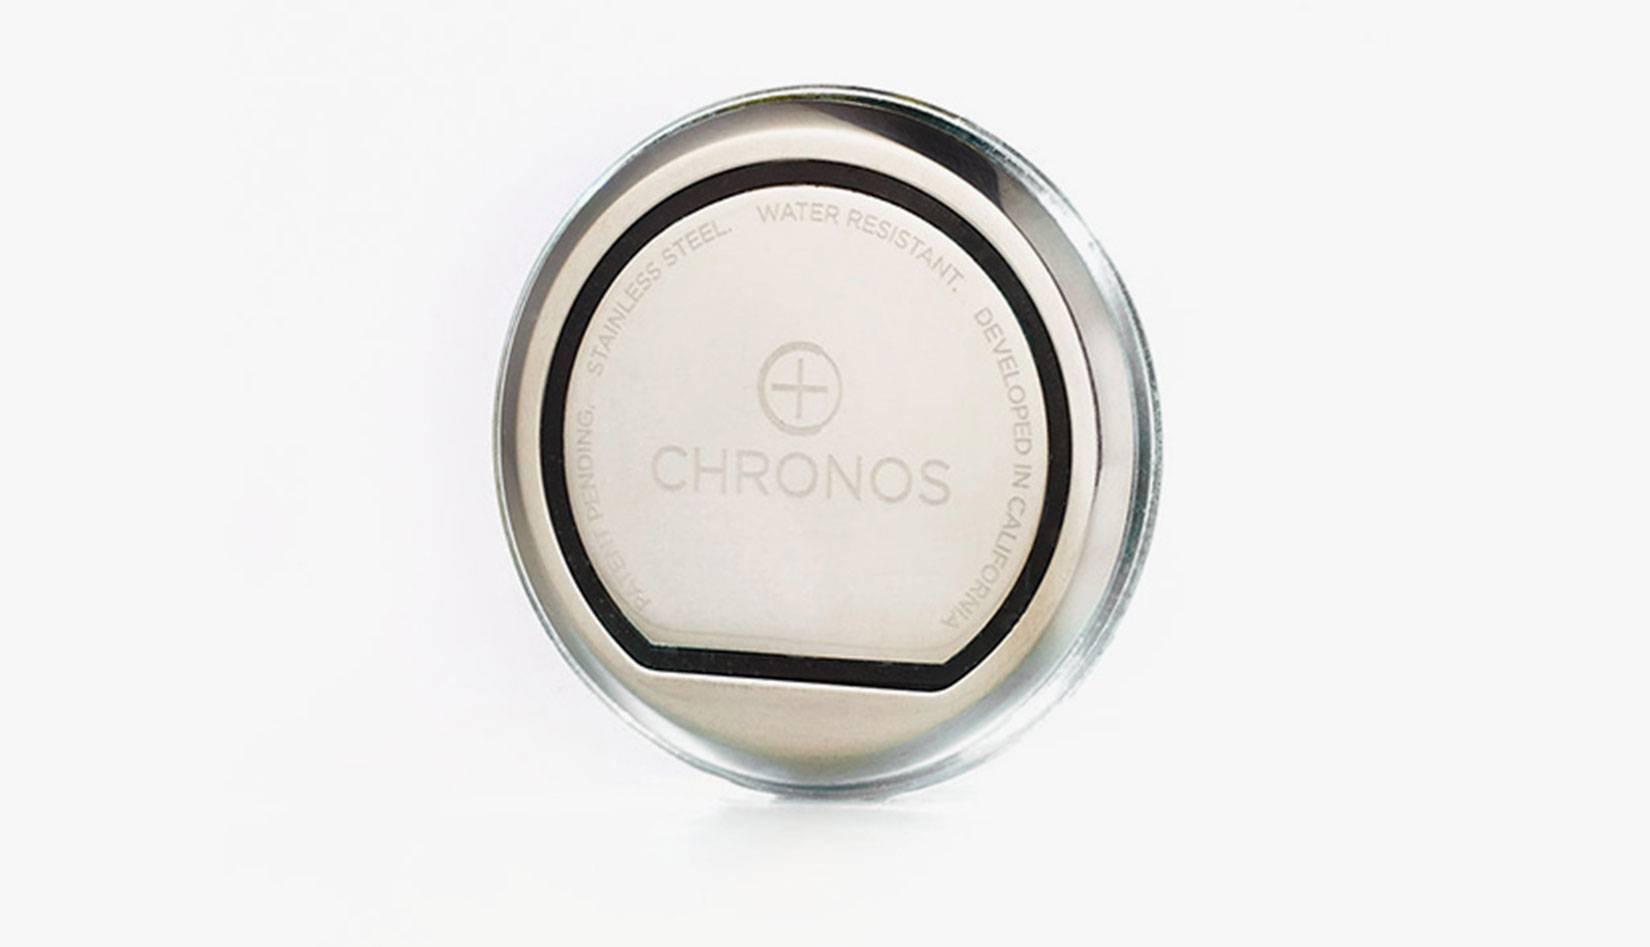 chronosdisc5-692e38212235b48b2f51cf1fdbf1c050.jpg